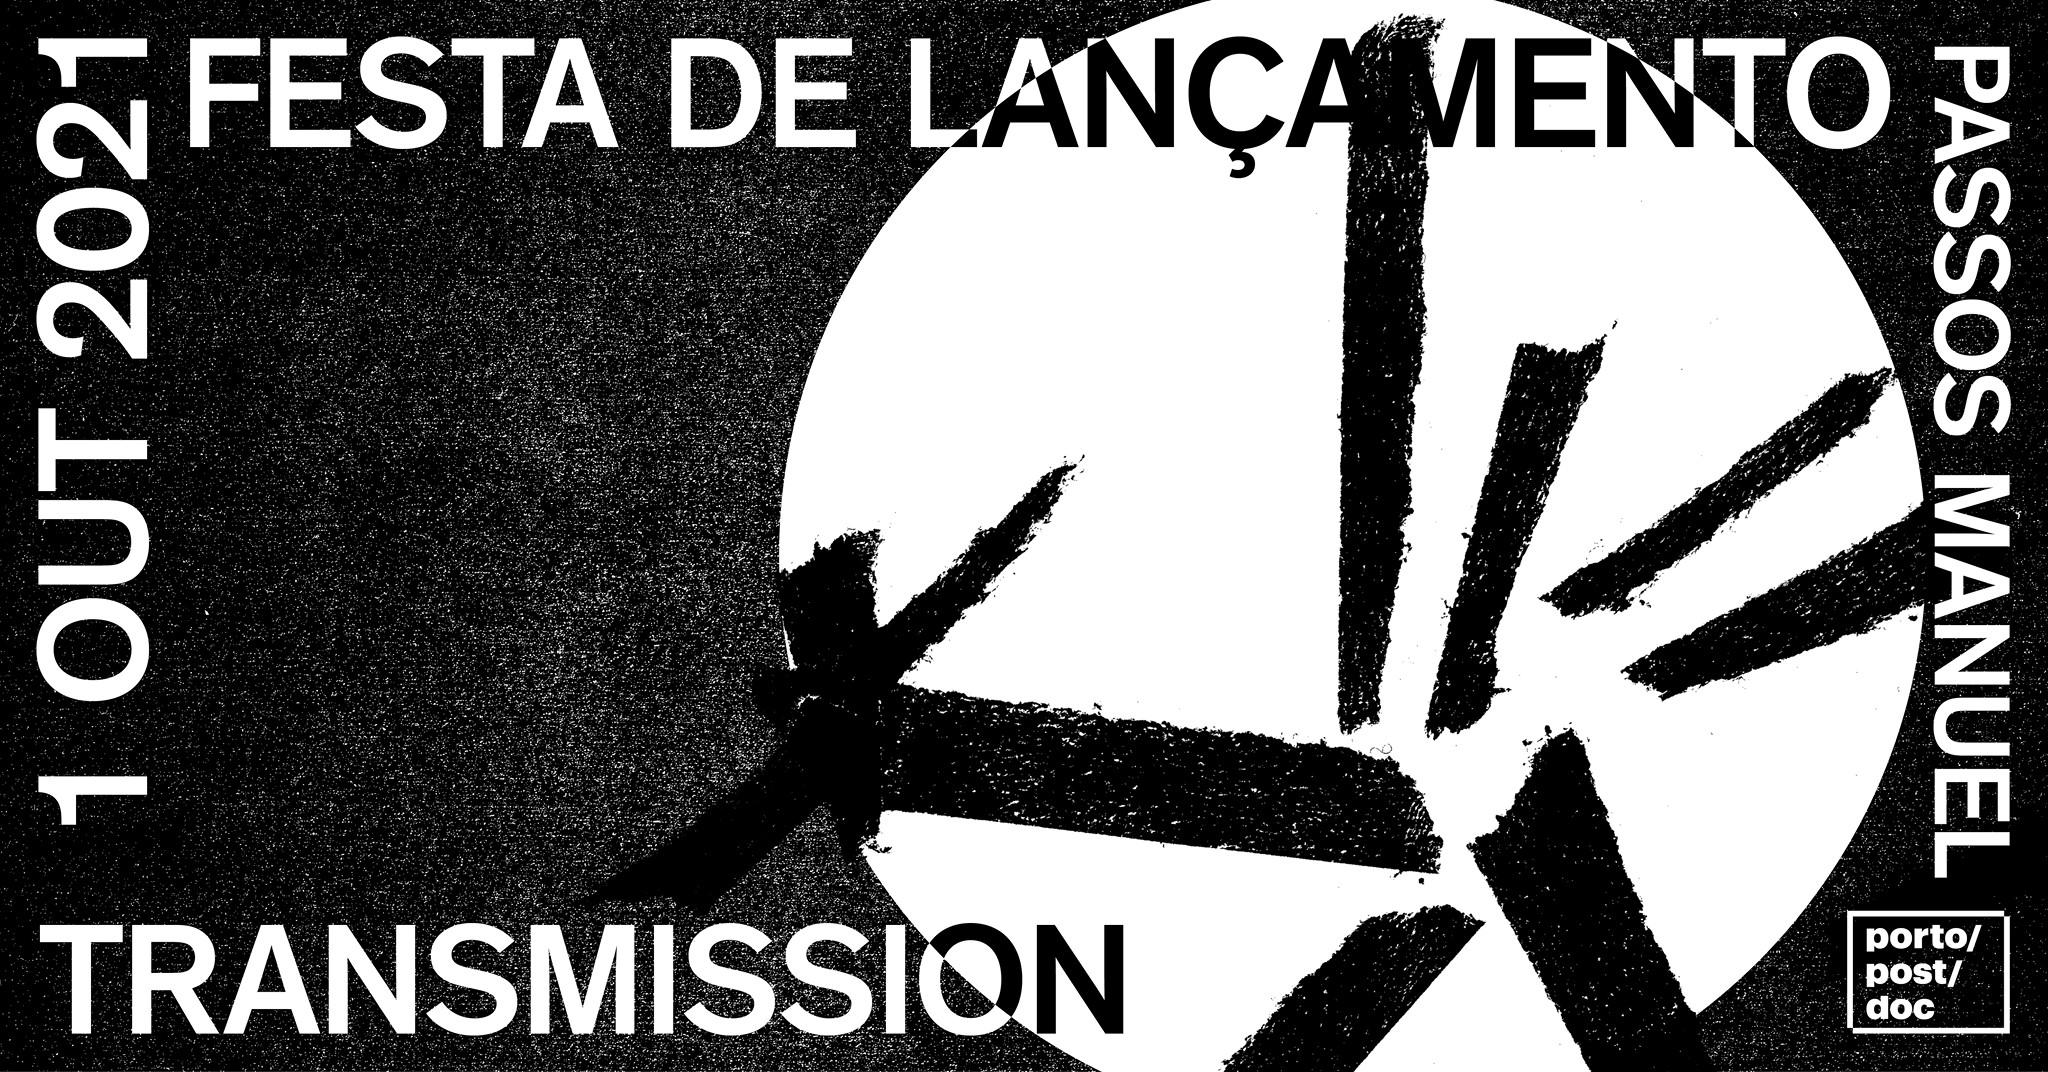 Transmission PPD'21 - Festa de Lançamento